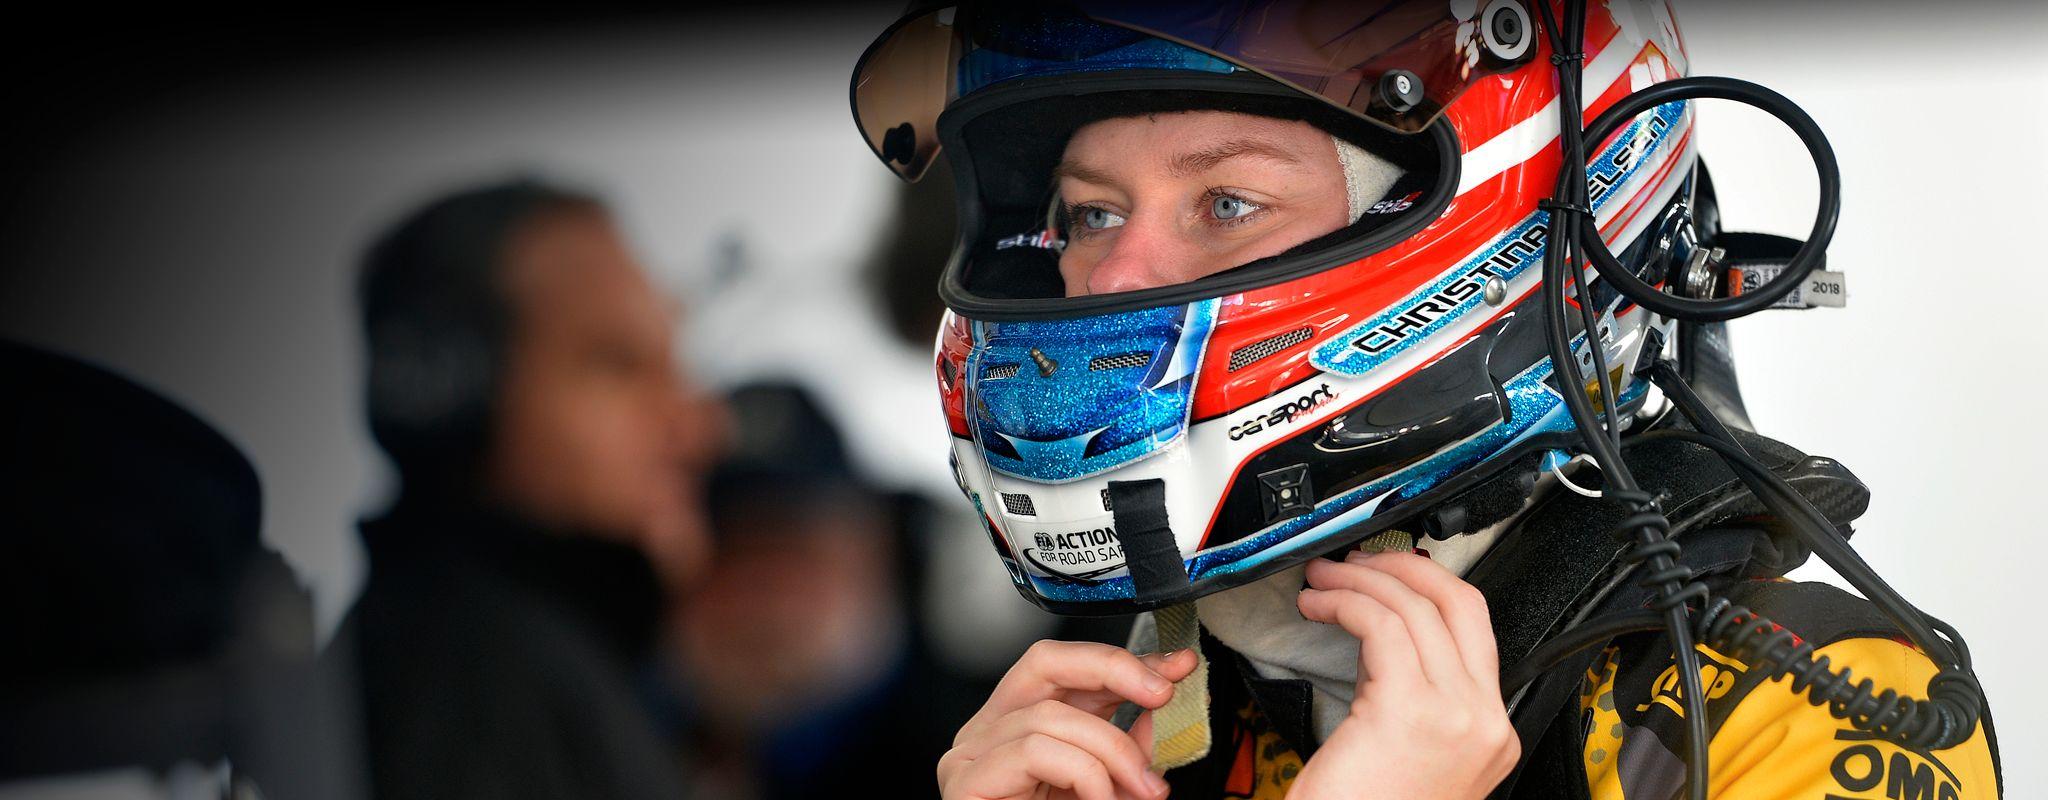 Christina Heinrich racing